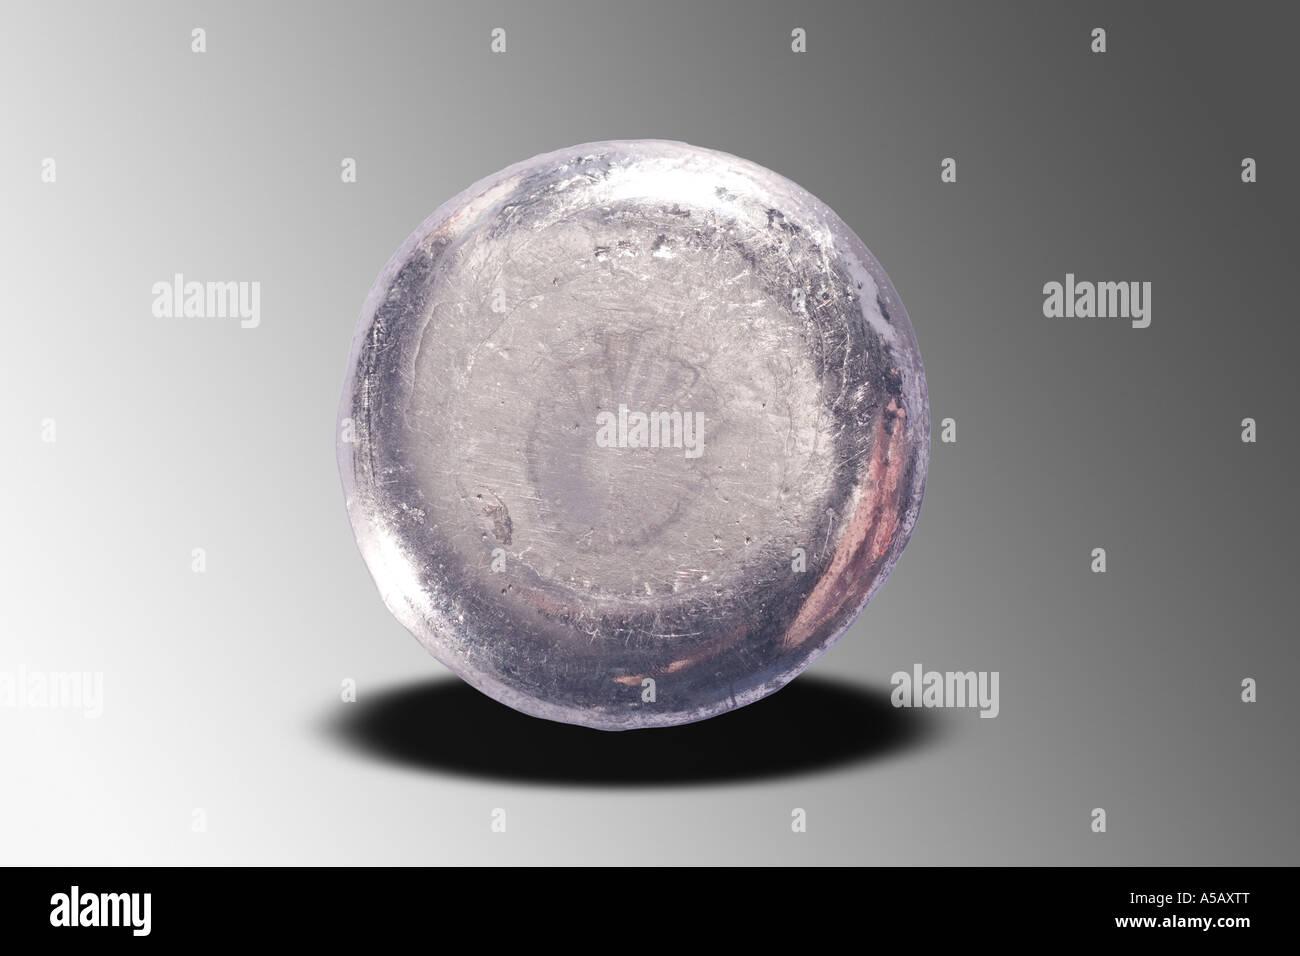 Lingote de plomo elemental Imagen De Stock